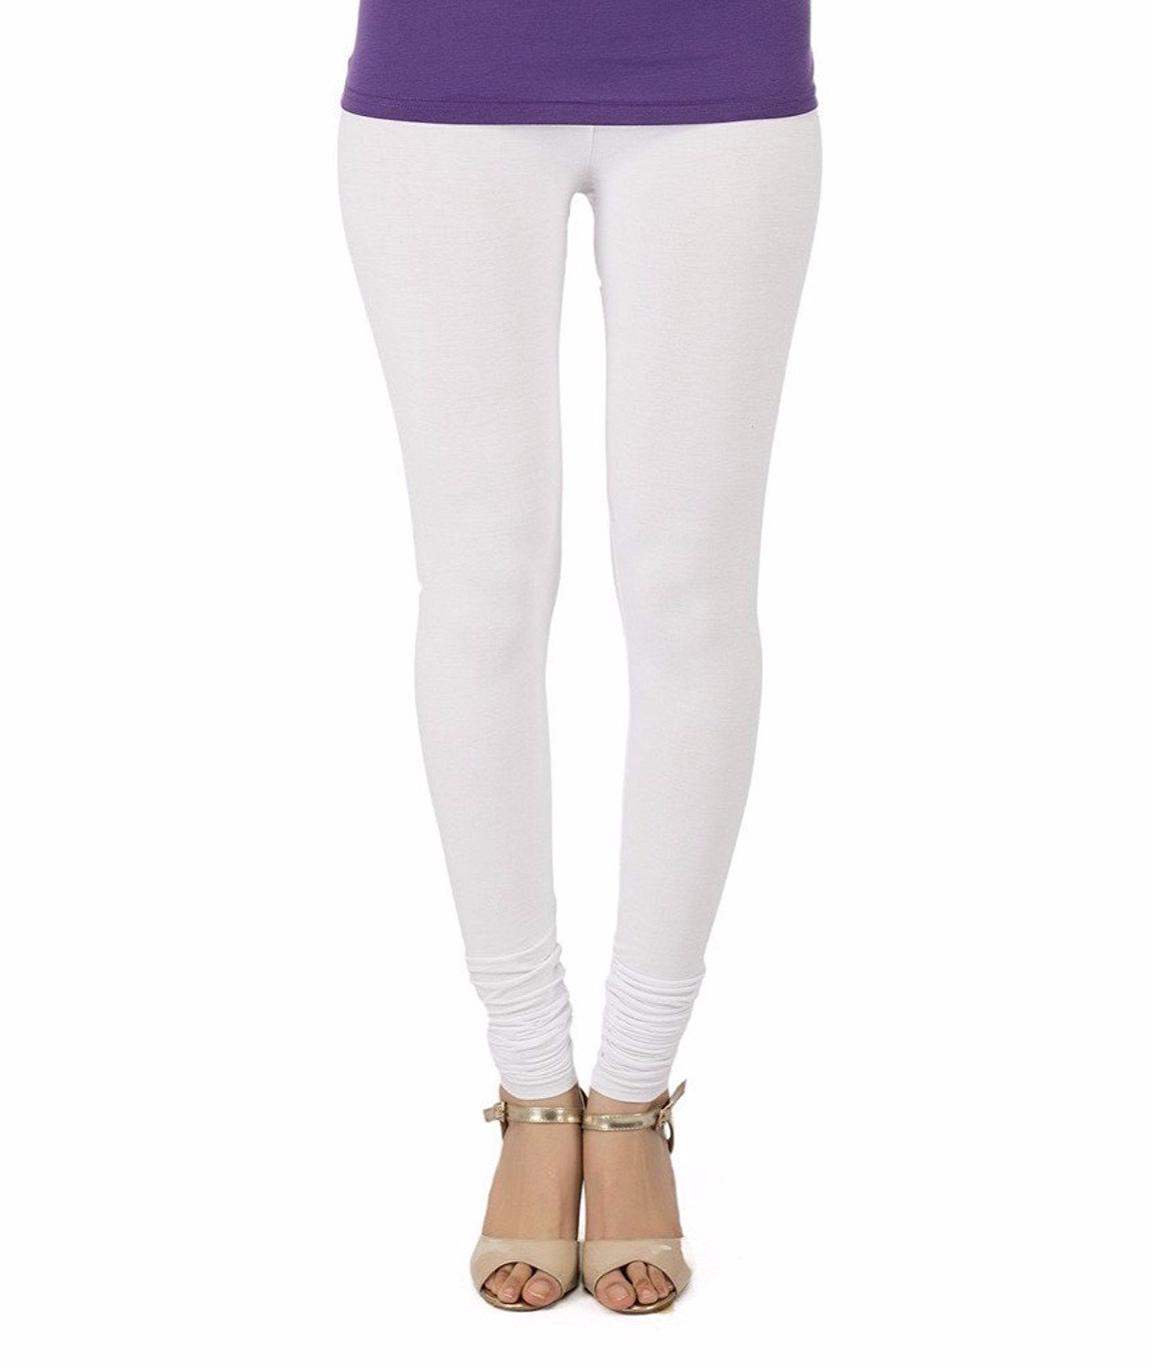 Swag Women`s Cotton Churidar Leggings (COLOUR : WHITE)